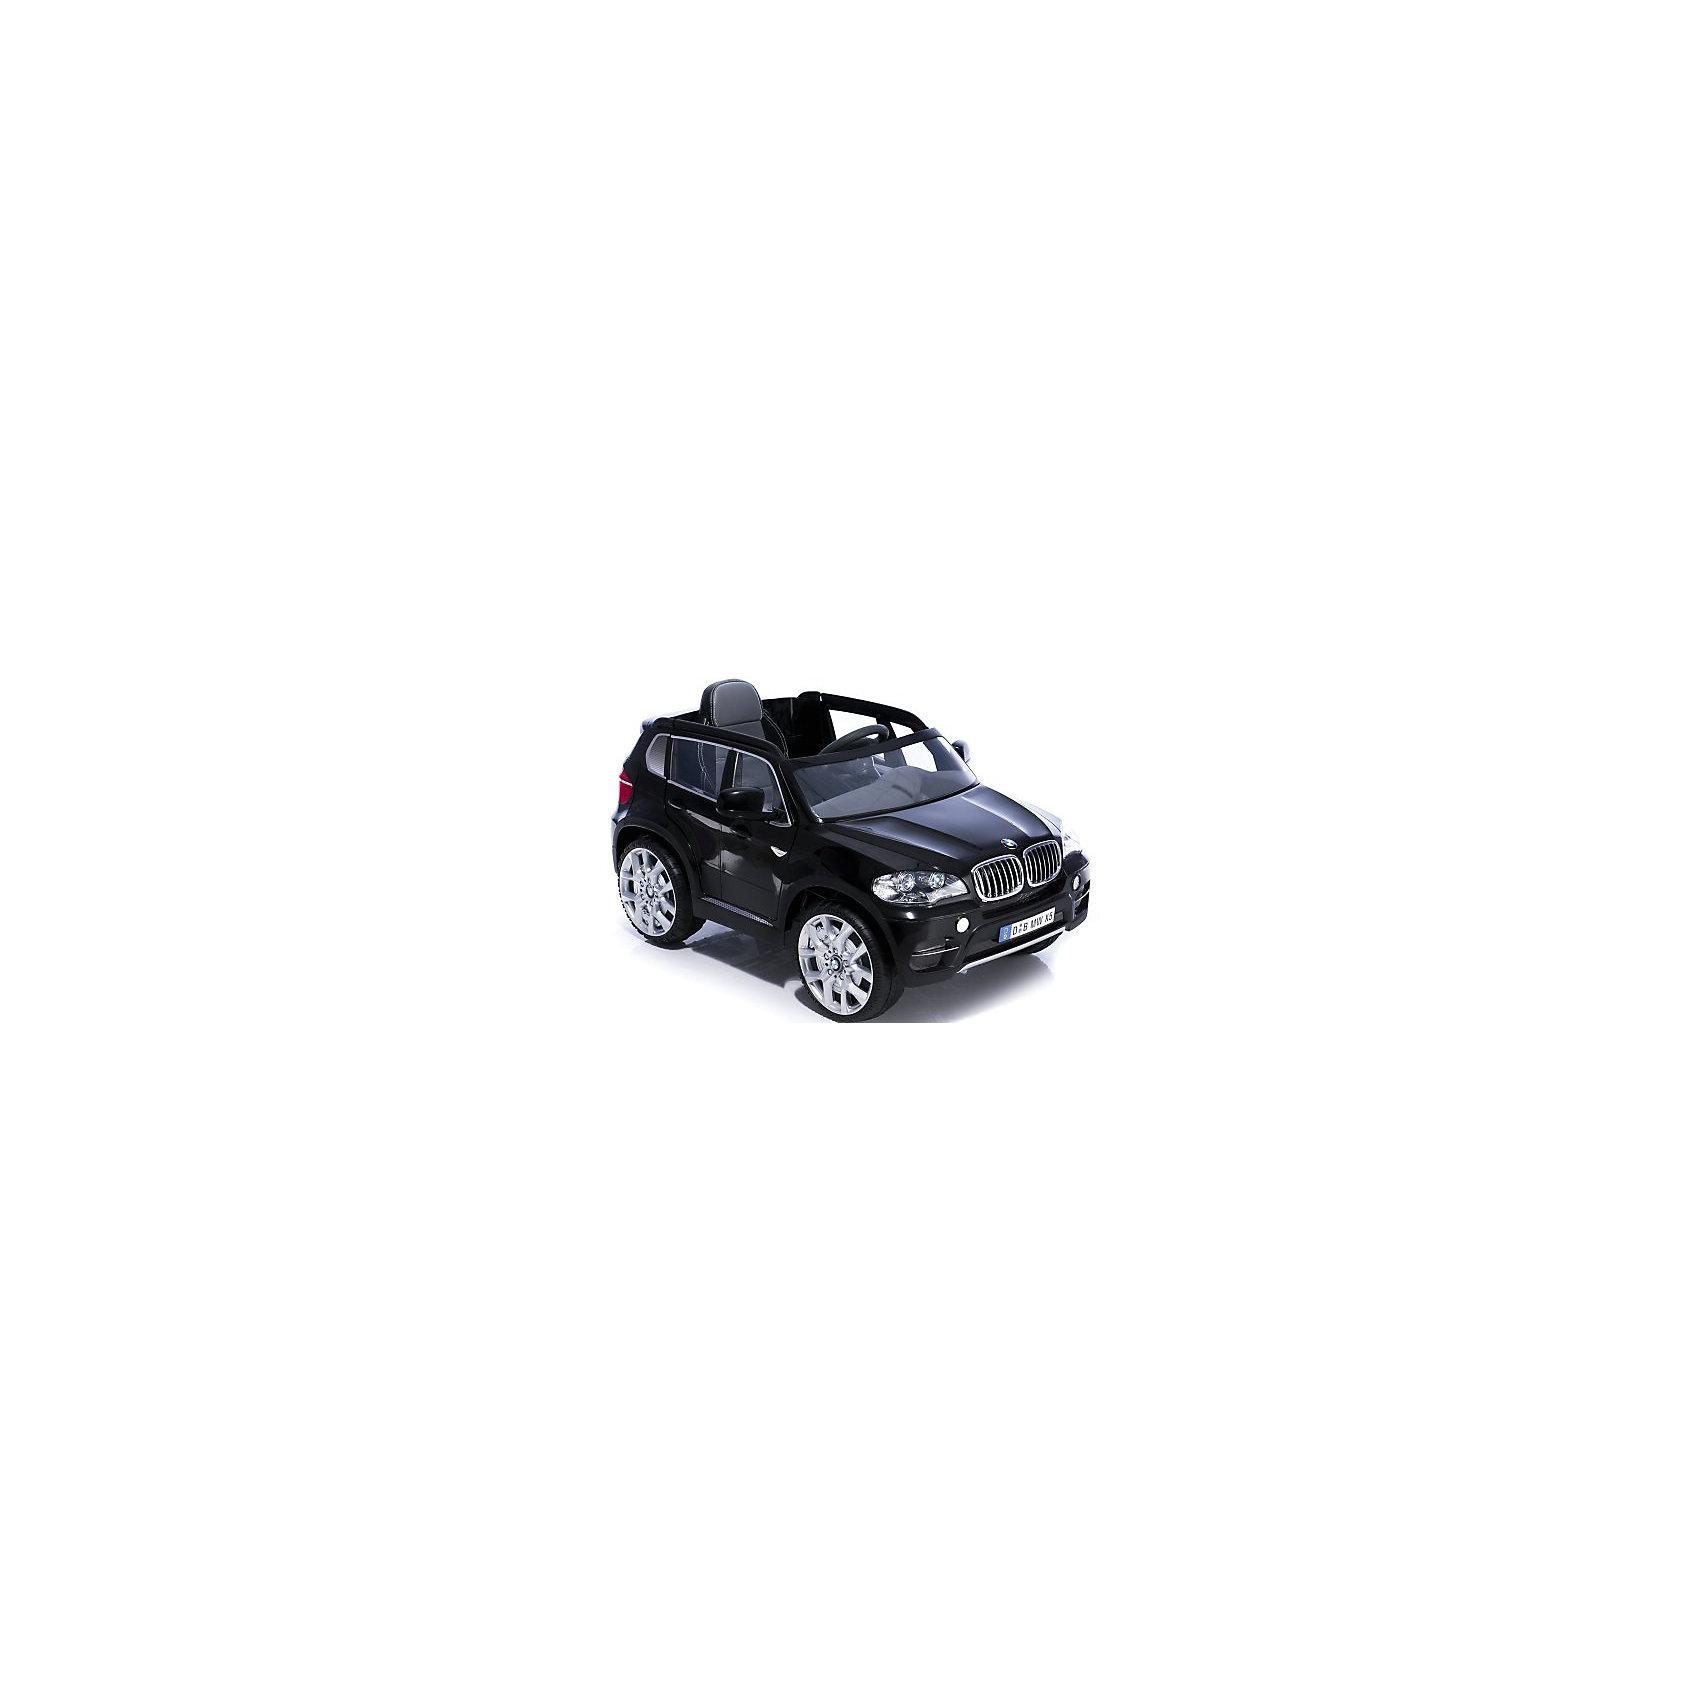 Электромобиль L200, Geoby, черный